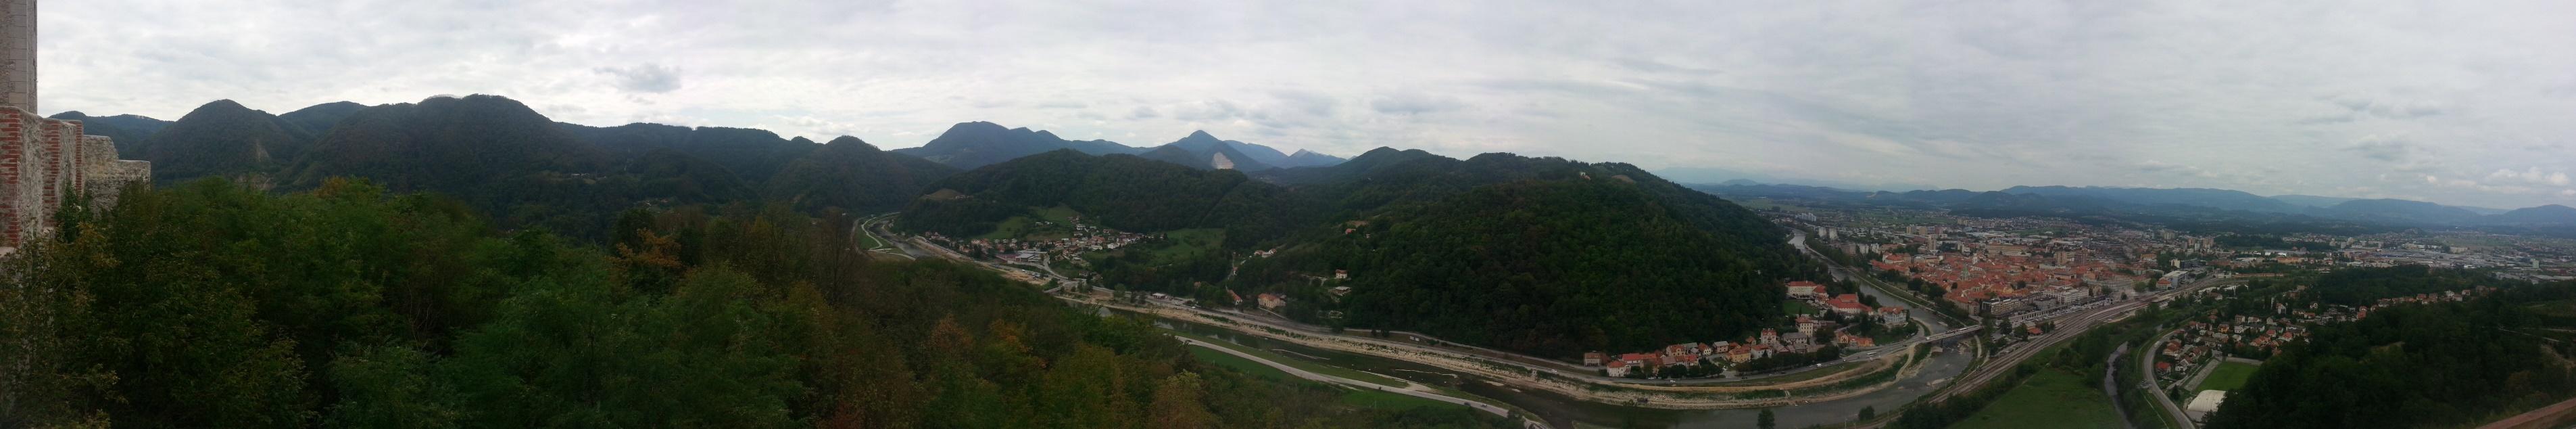 Slovenia 11